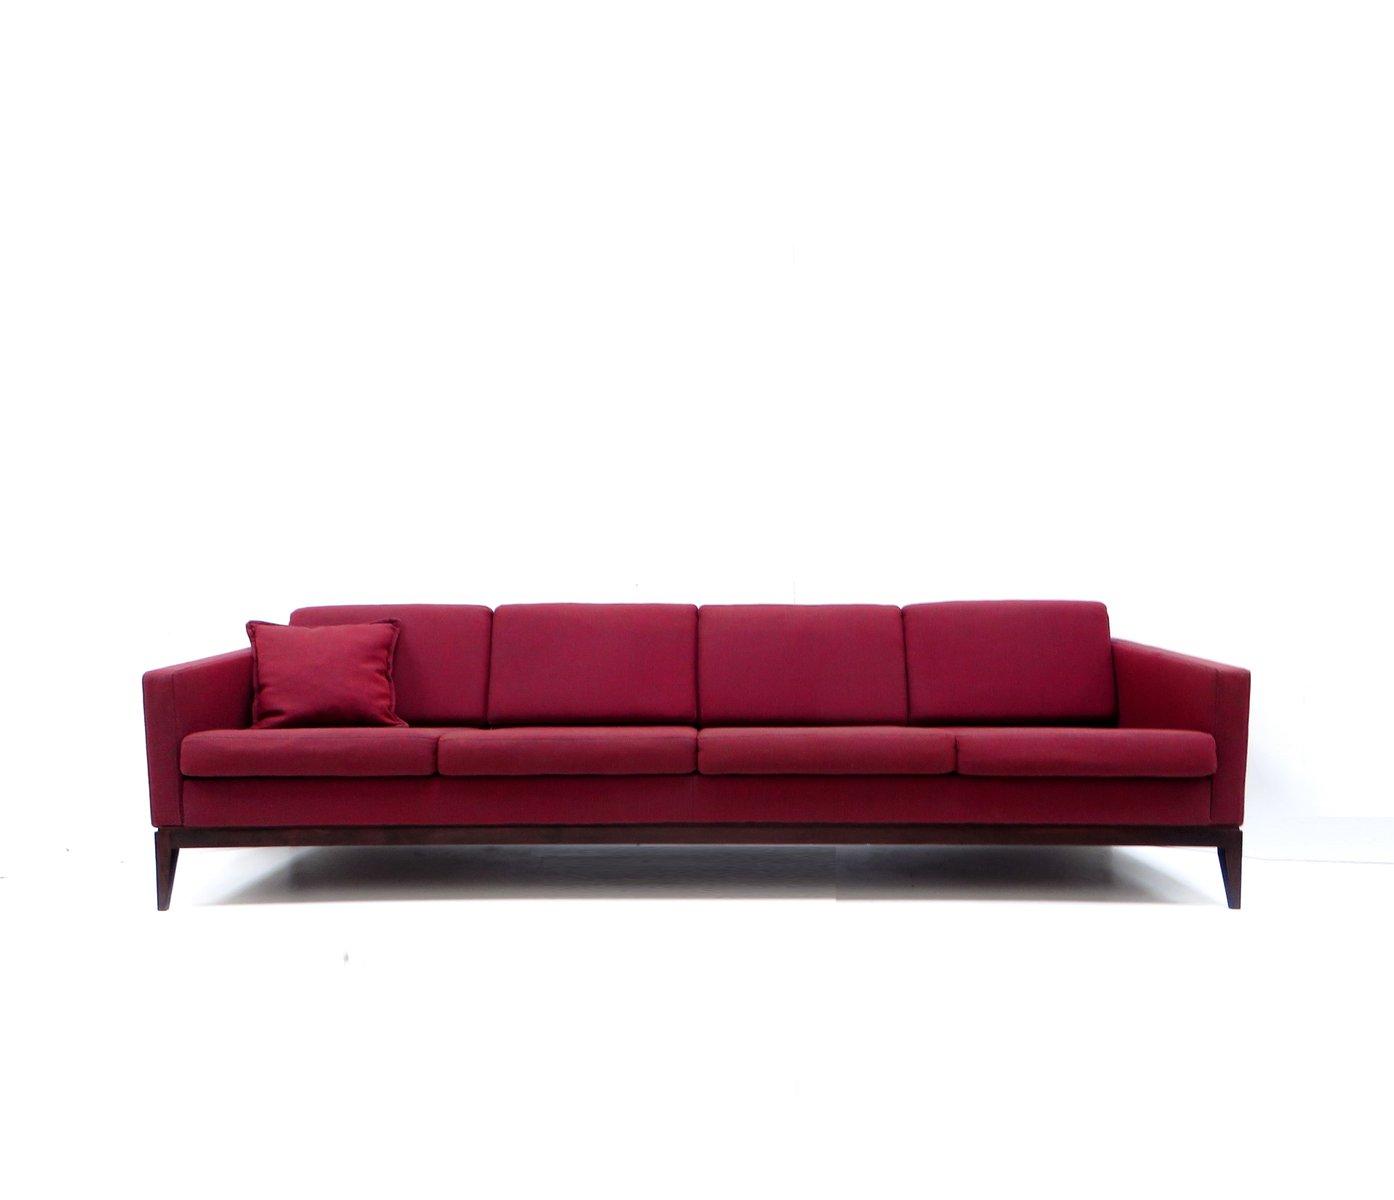 gro es vintage burgunderrotes vier sitzer sofa bei pamono. Black Bedroom Furniture Sets. Home Design Ideas